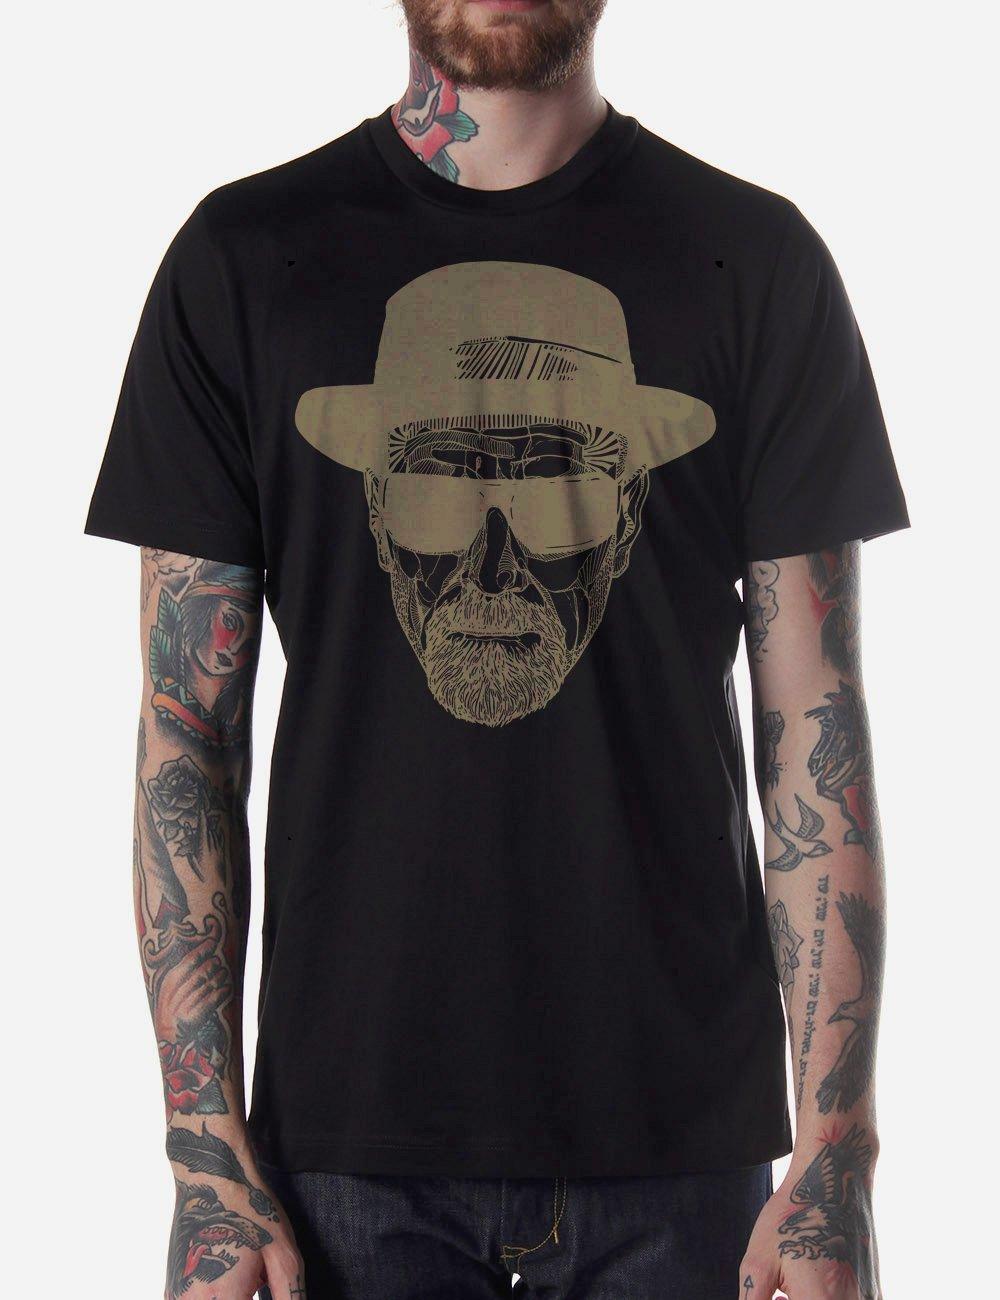 Black Men Tshirt Heisenberg Breaking Bad Head Black Tshirt For Men